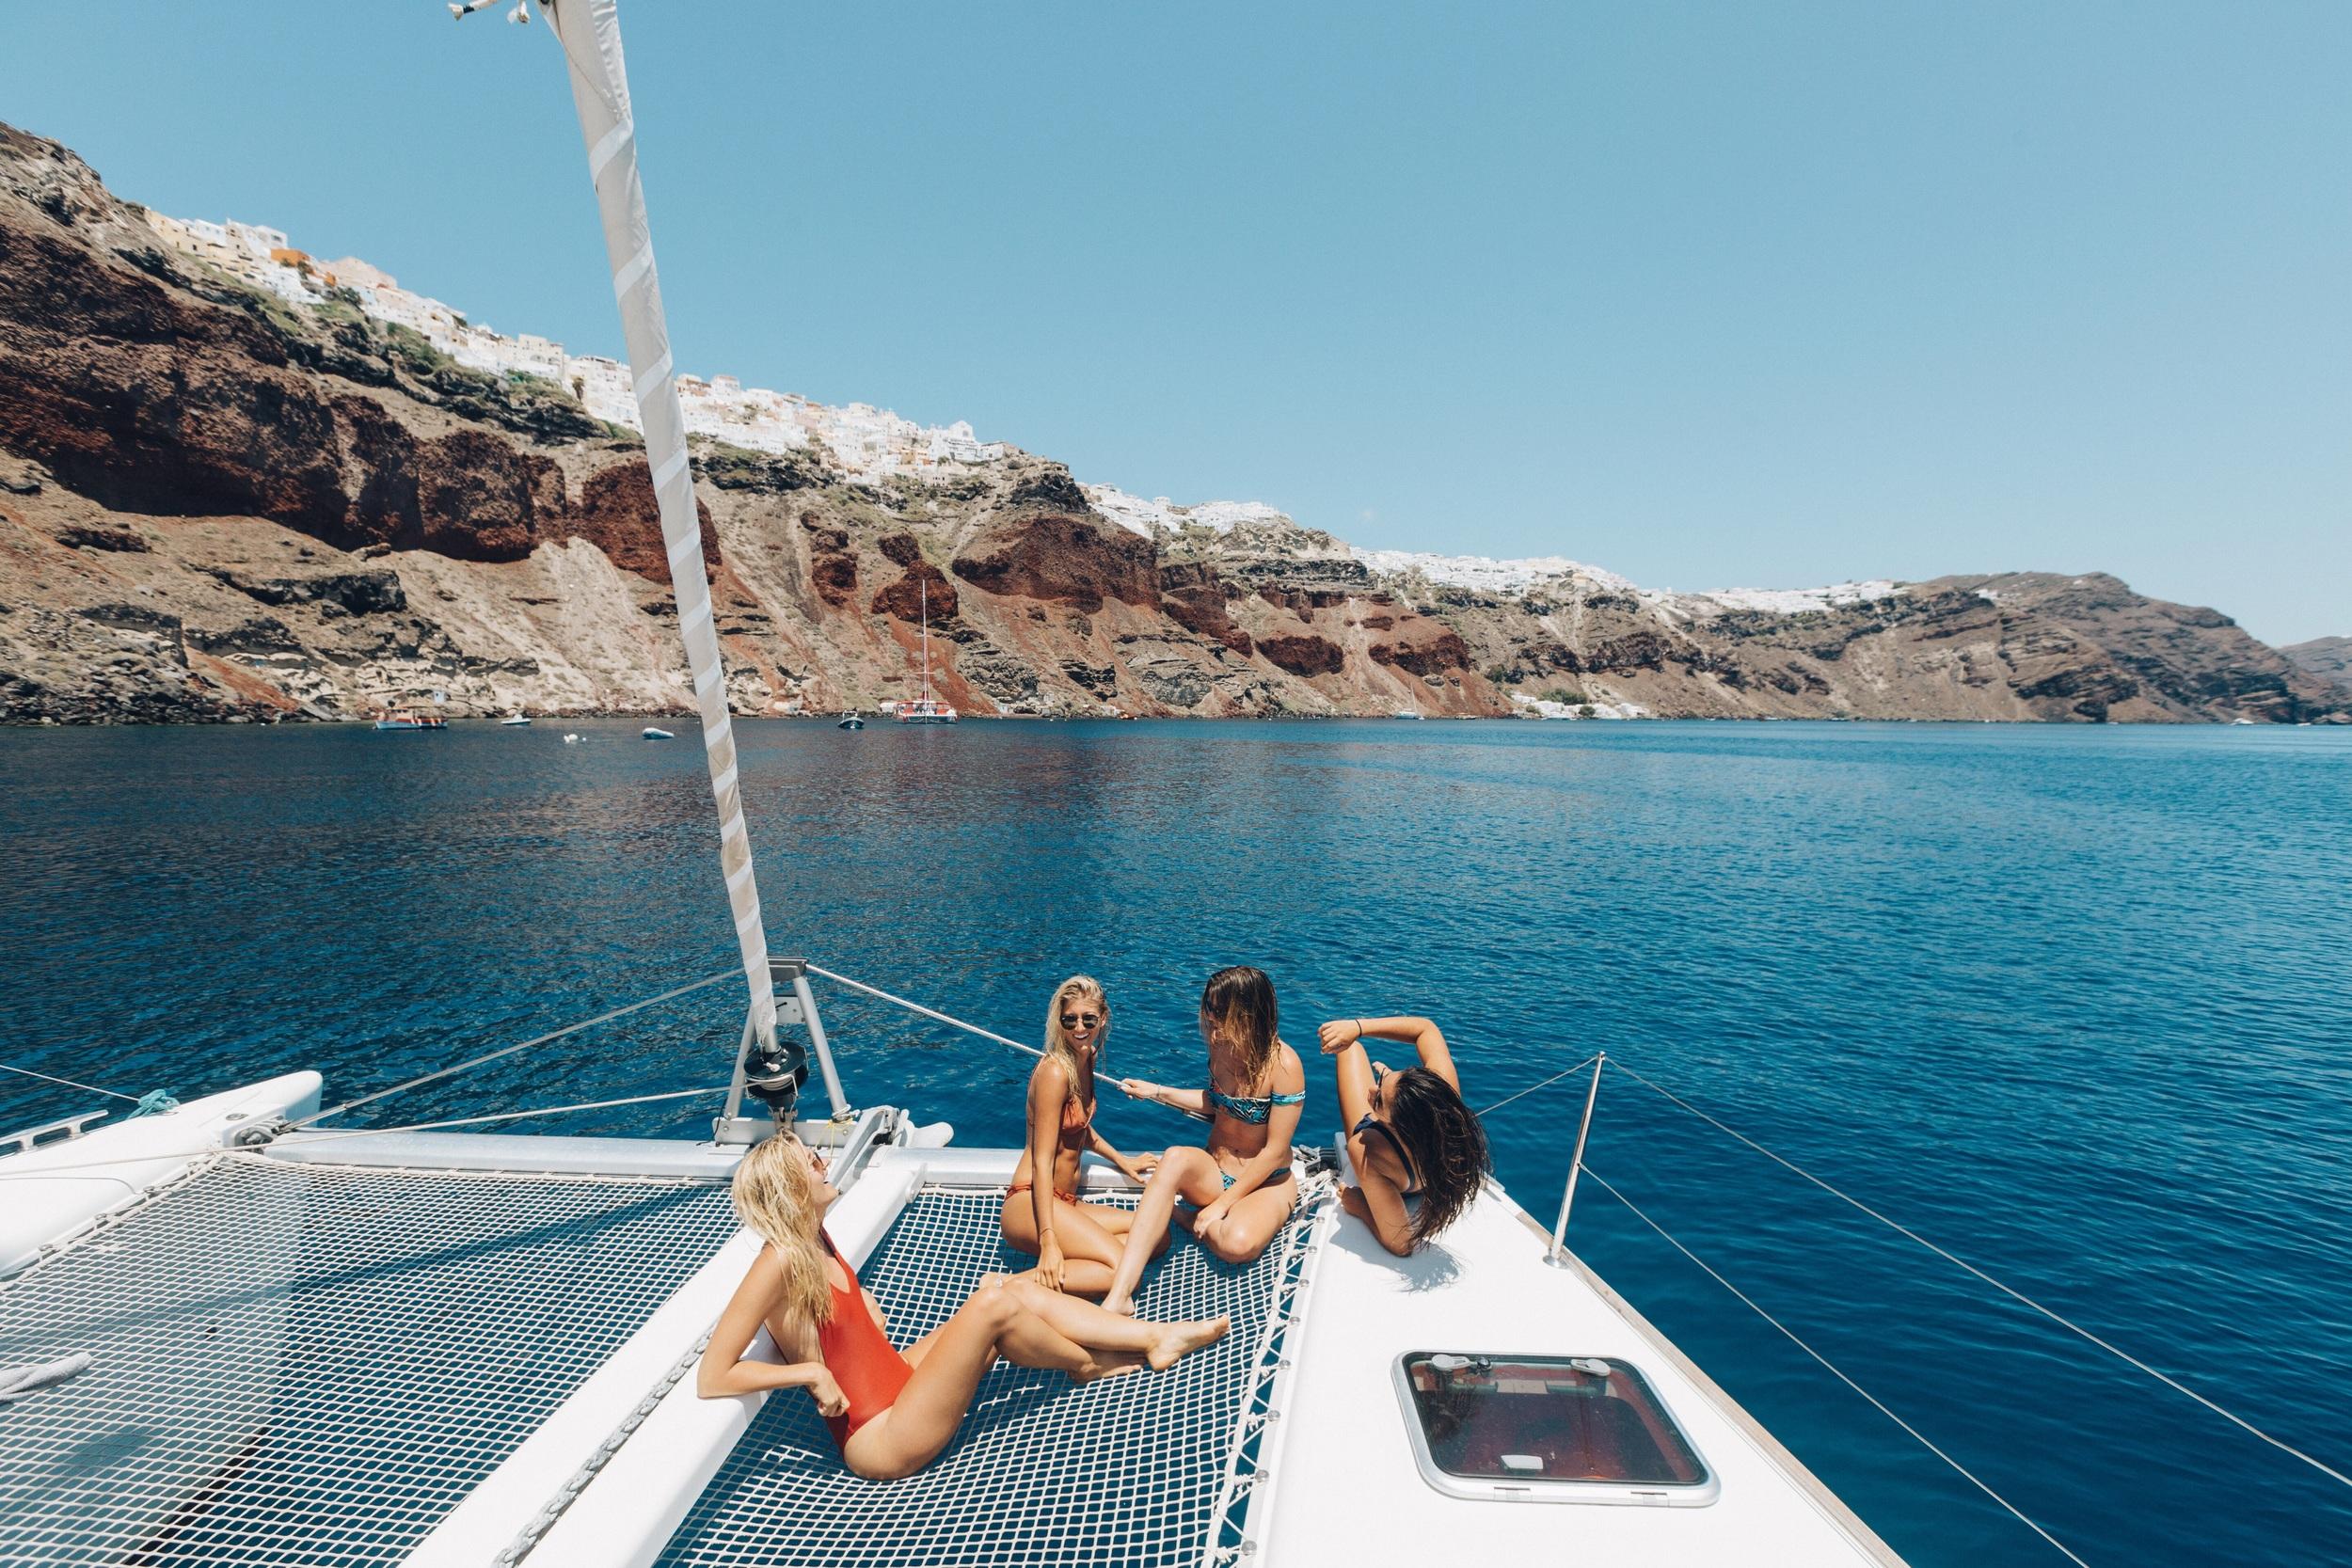 Sailing around Santorini with my fav gals